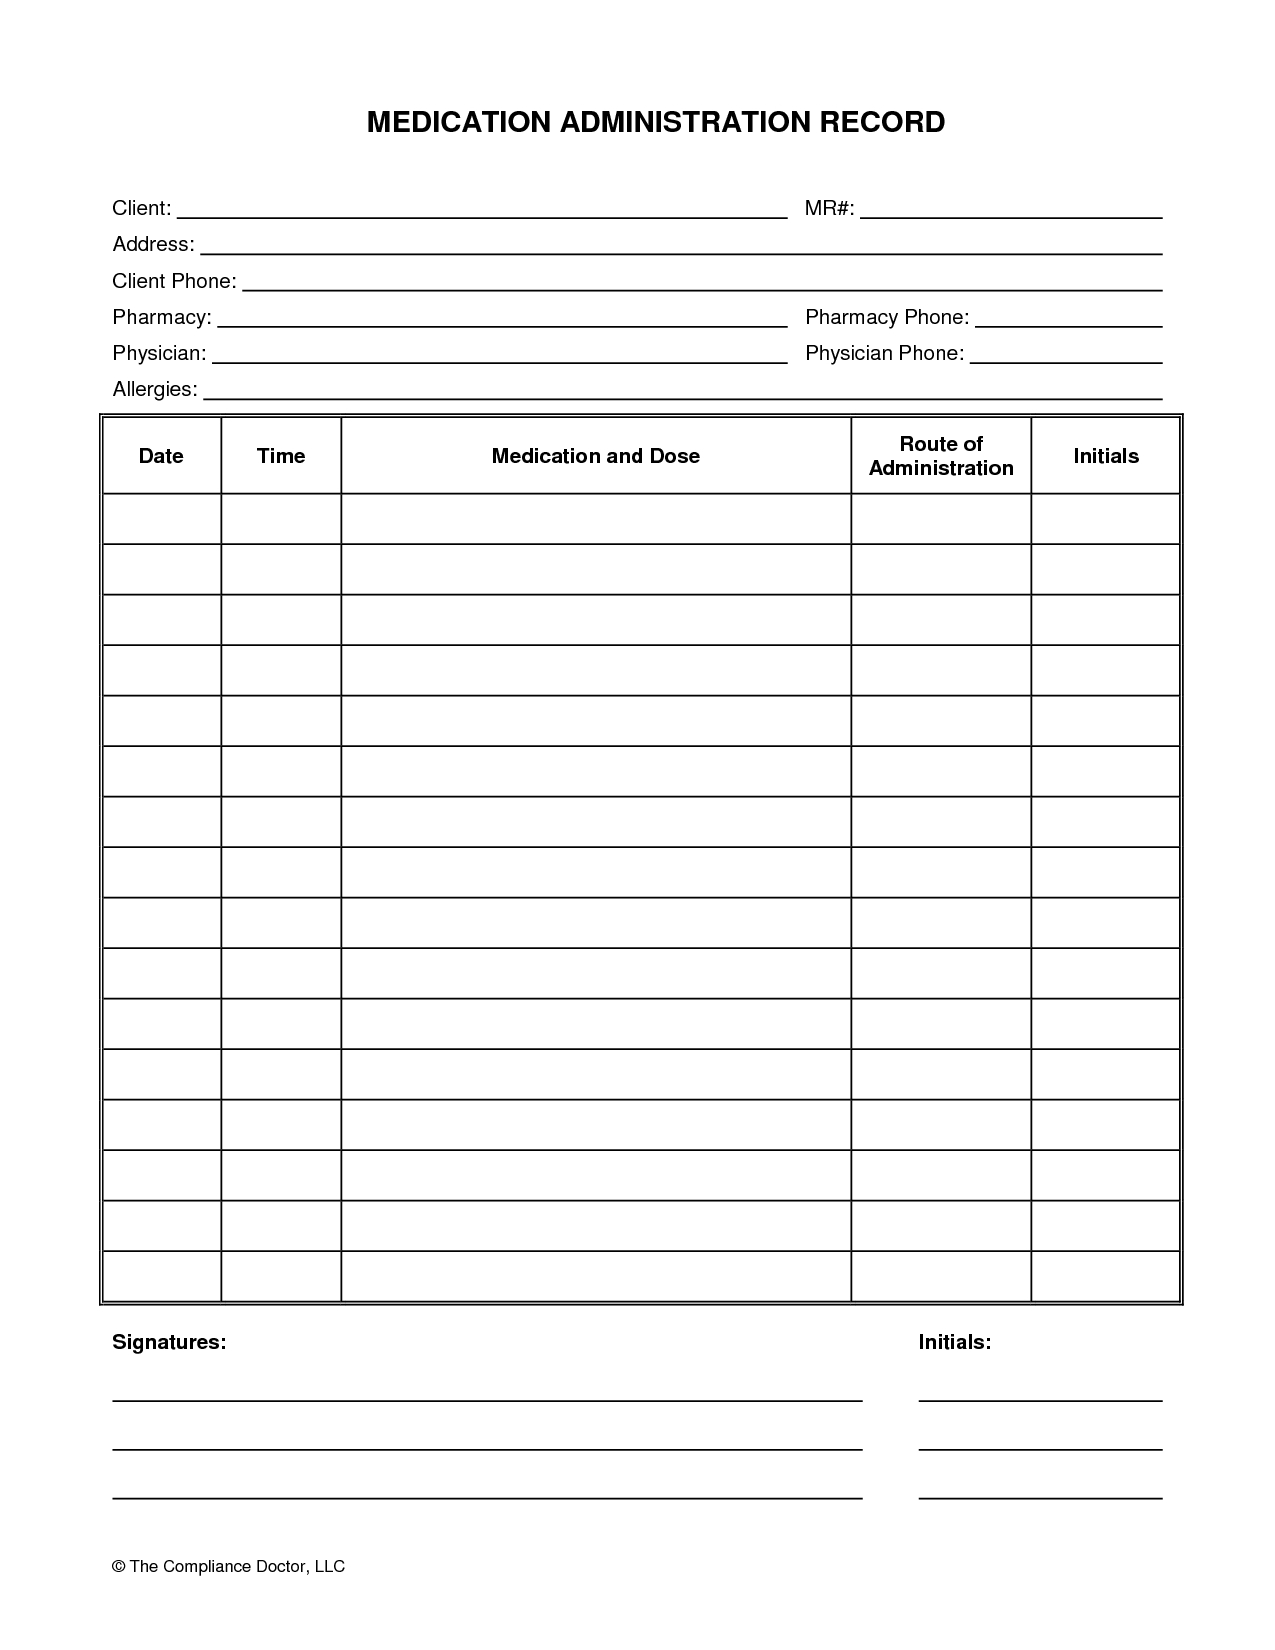 Medication Administration Record Form | Organization | Medication - Free Printable Medication List Template